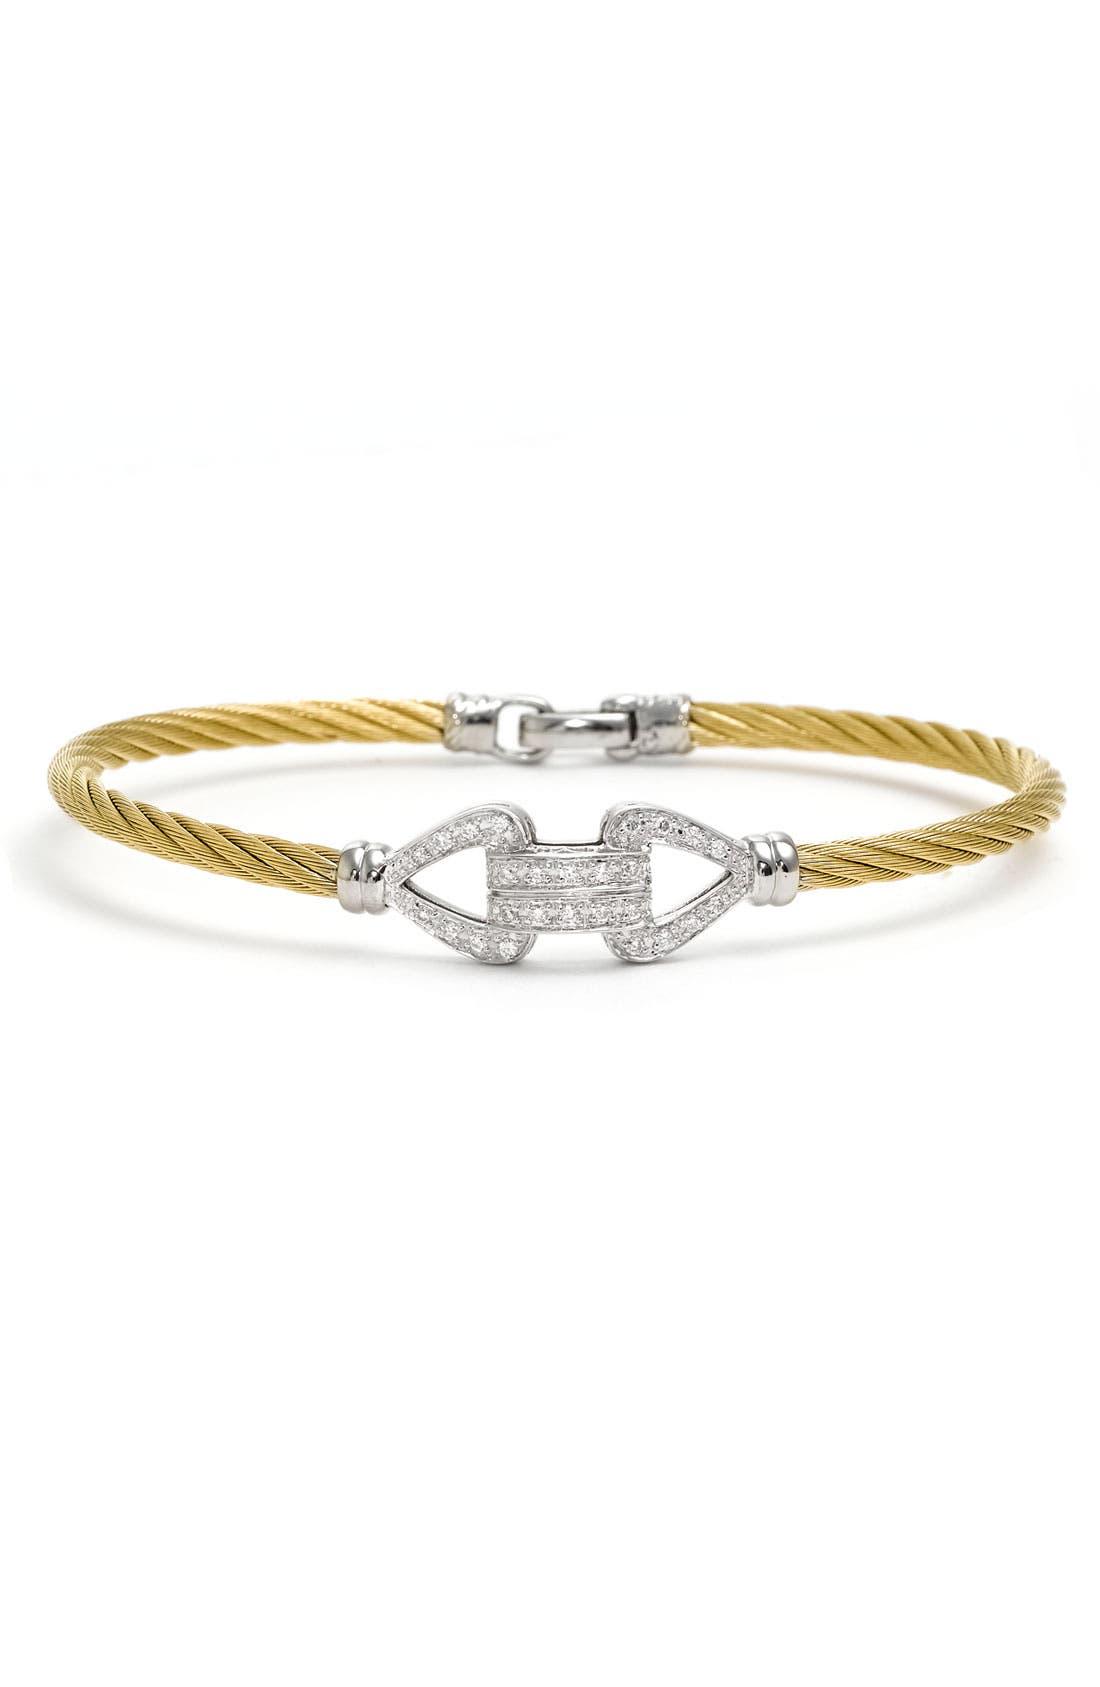 Alternate Image 1 Selected - ALOR® Double Bar Diamond Knot Bangle